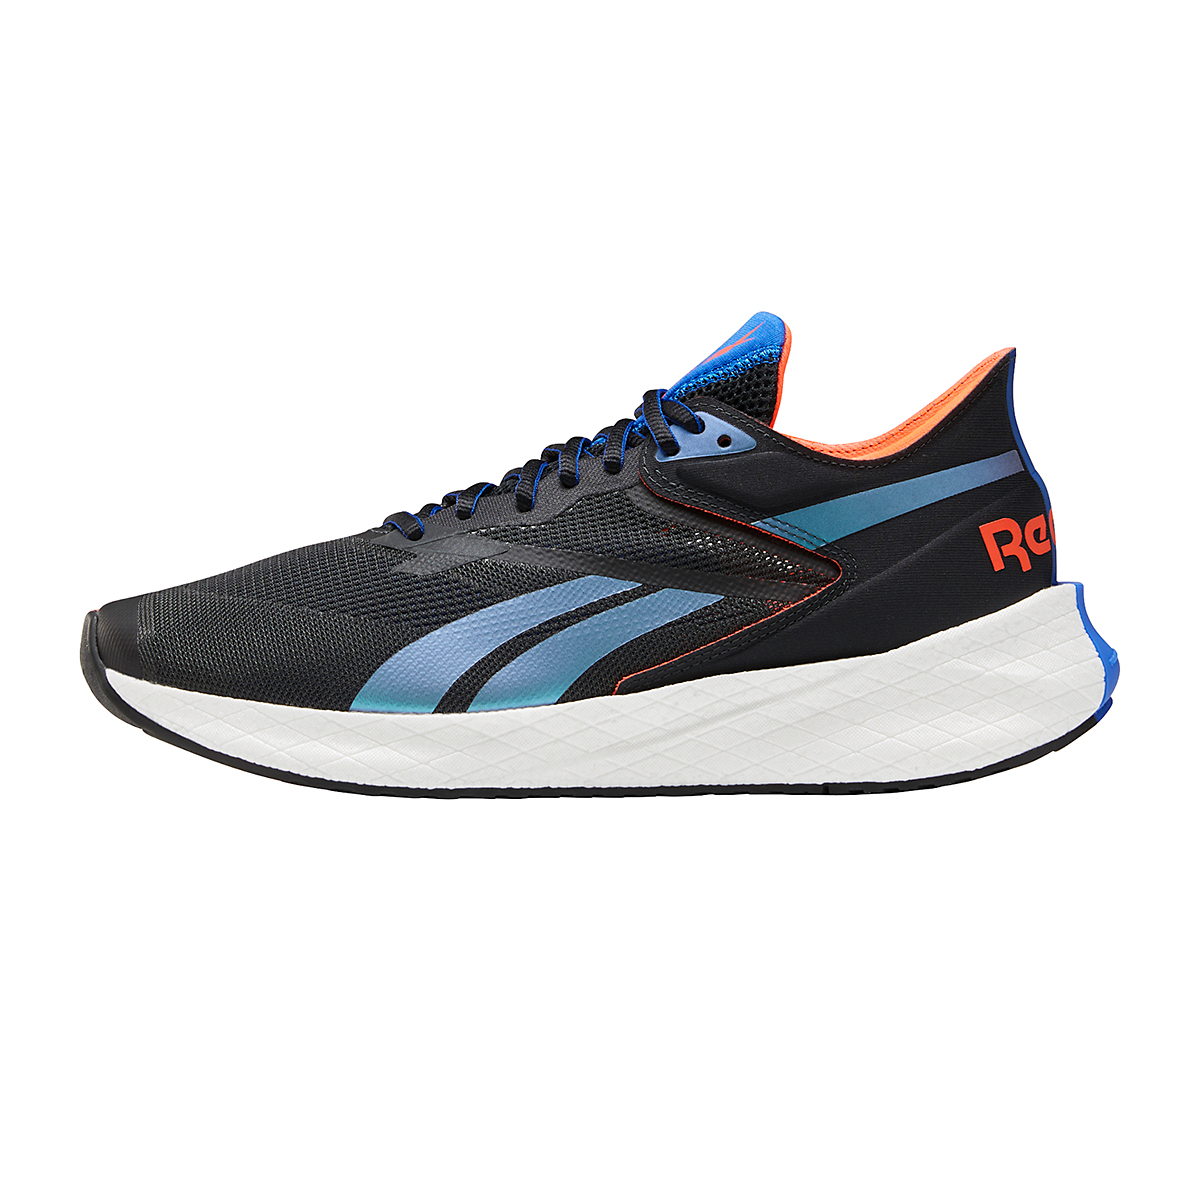 Men's Reebok Floatride Energy Symmetros Running Shoe - Color: Night Black/Court Blue/Orange Flare - Size: 7 - Width: Regular, Night Black/Court Blue/Orange Flare, large, image 2